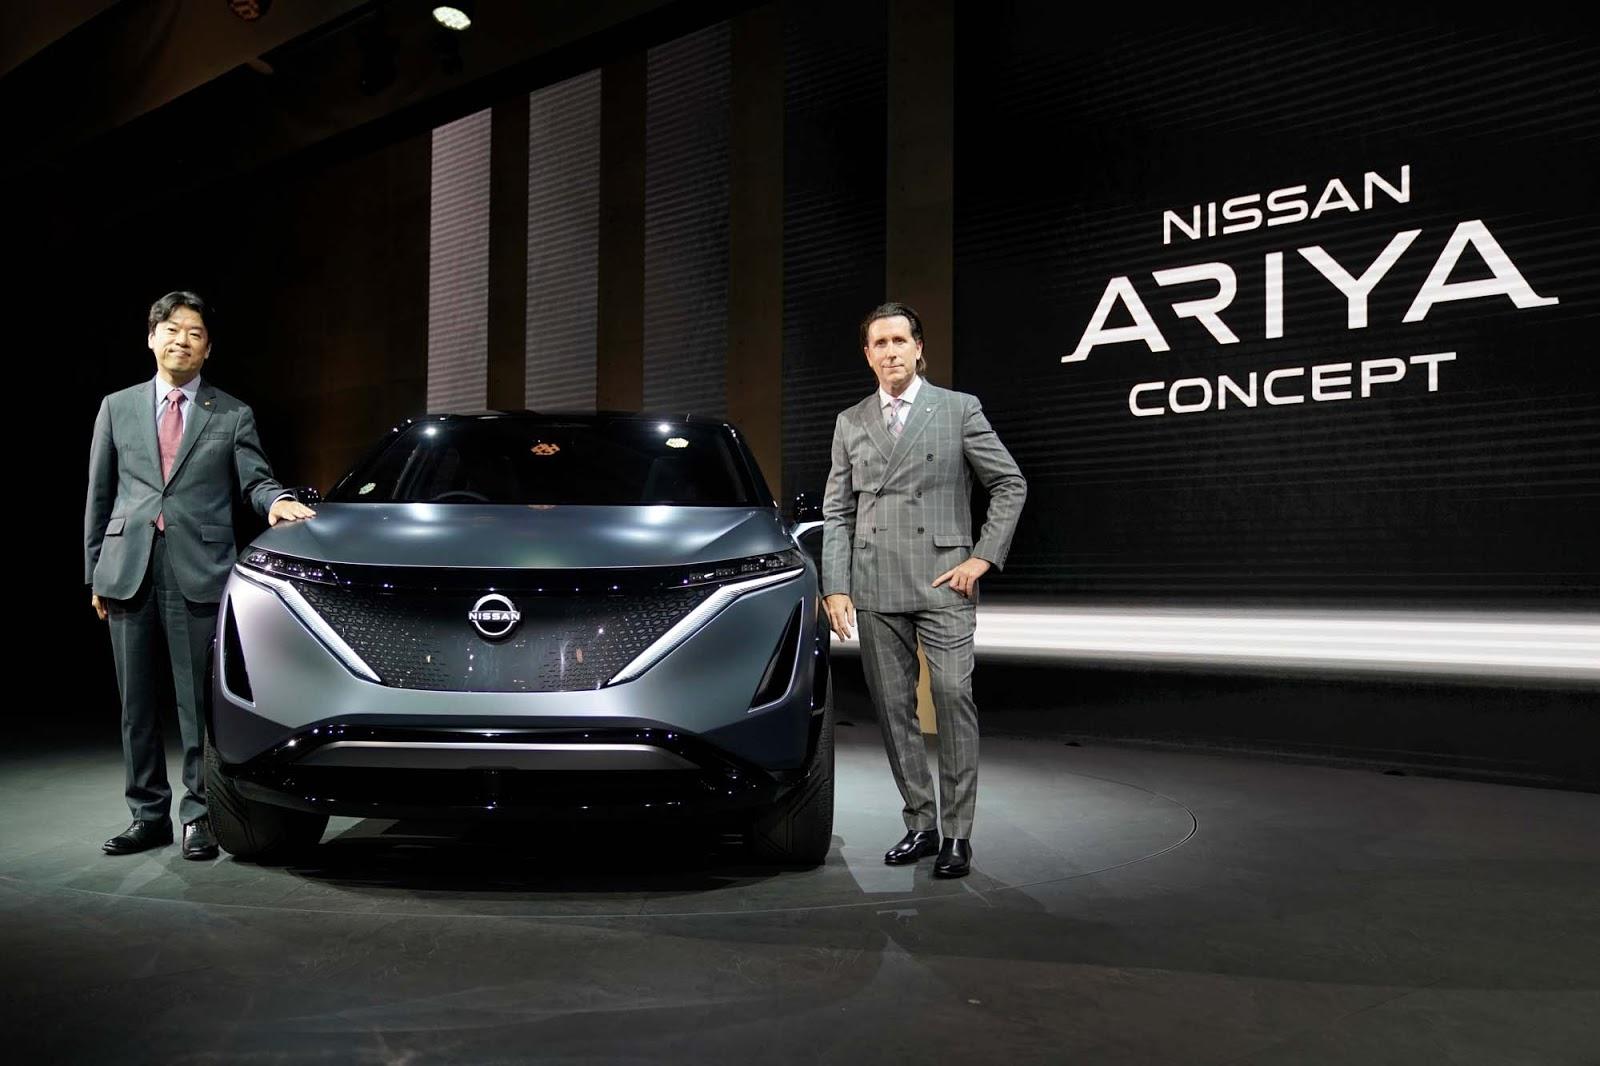 Press2BCOnference2BCam2B3 1 Με αυτό το μοντέλο η Nissan μας δείχνει το μέλλον της Electric cars, Nissan, Έκθεση, ιαπωνικά